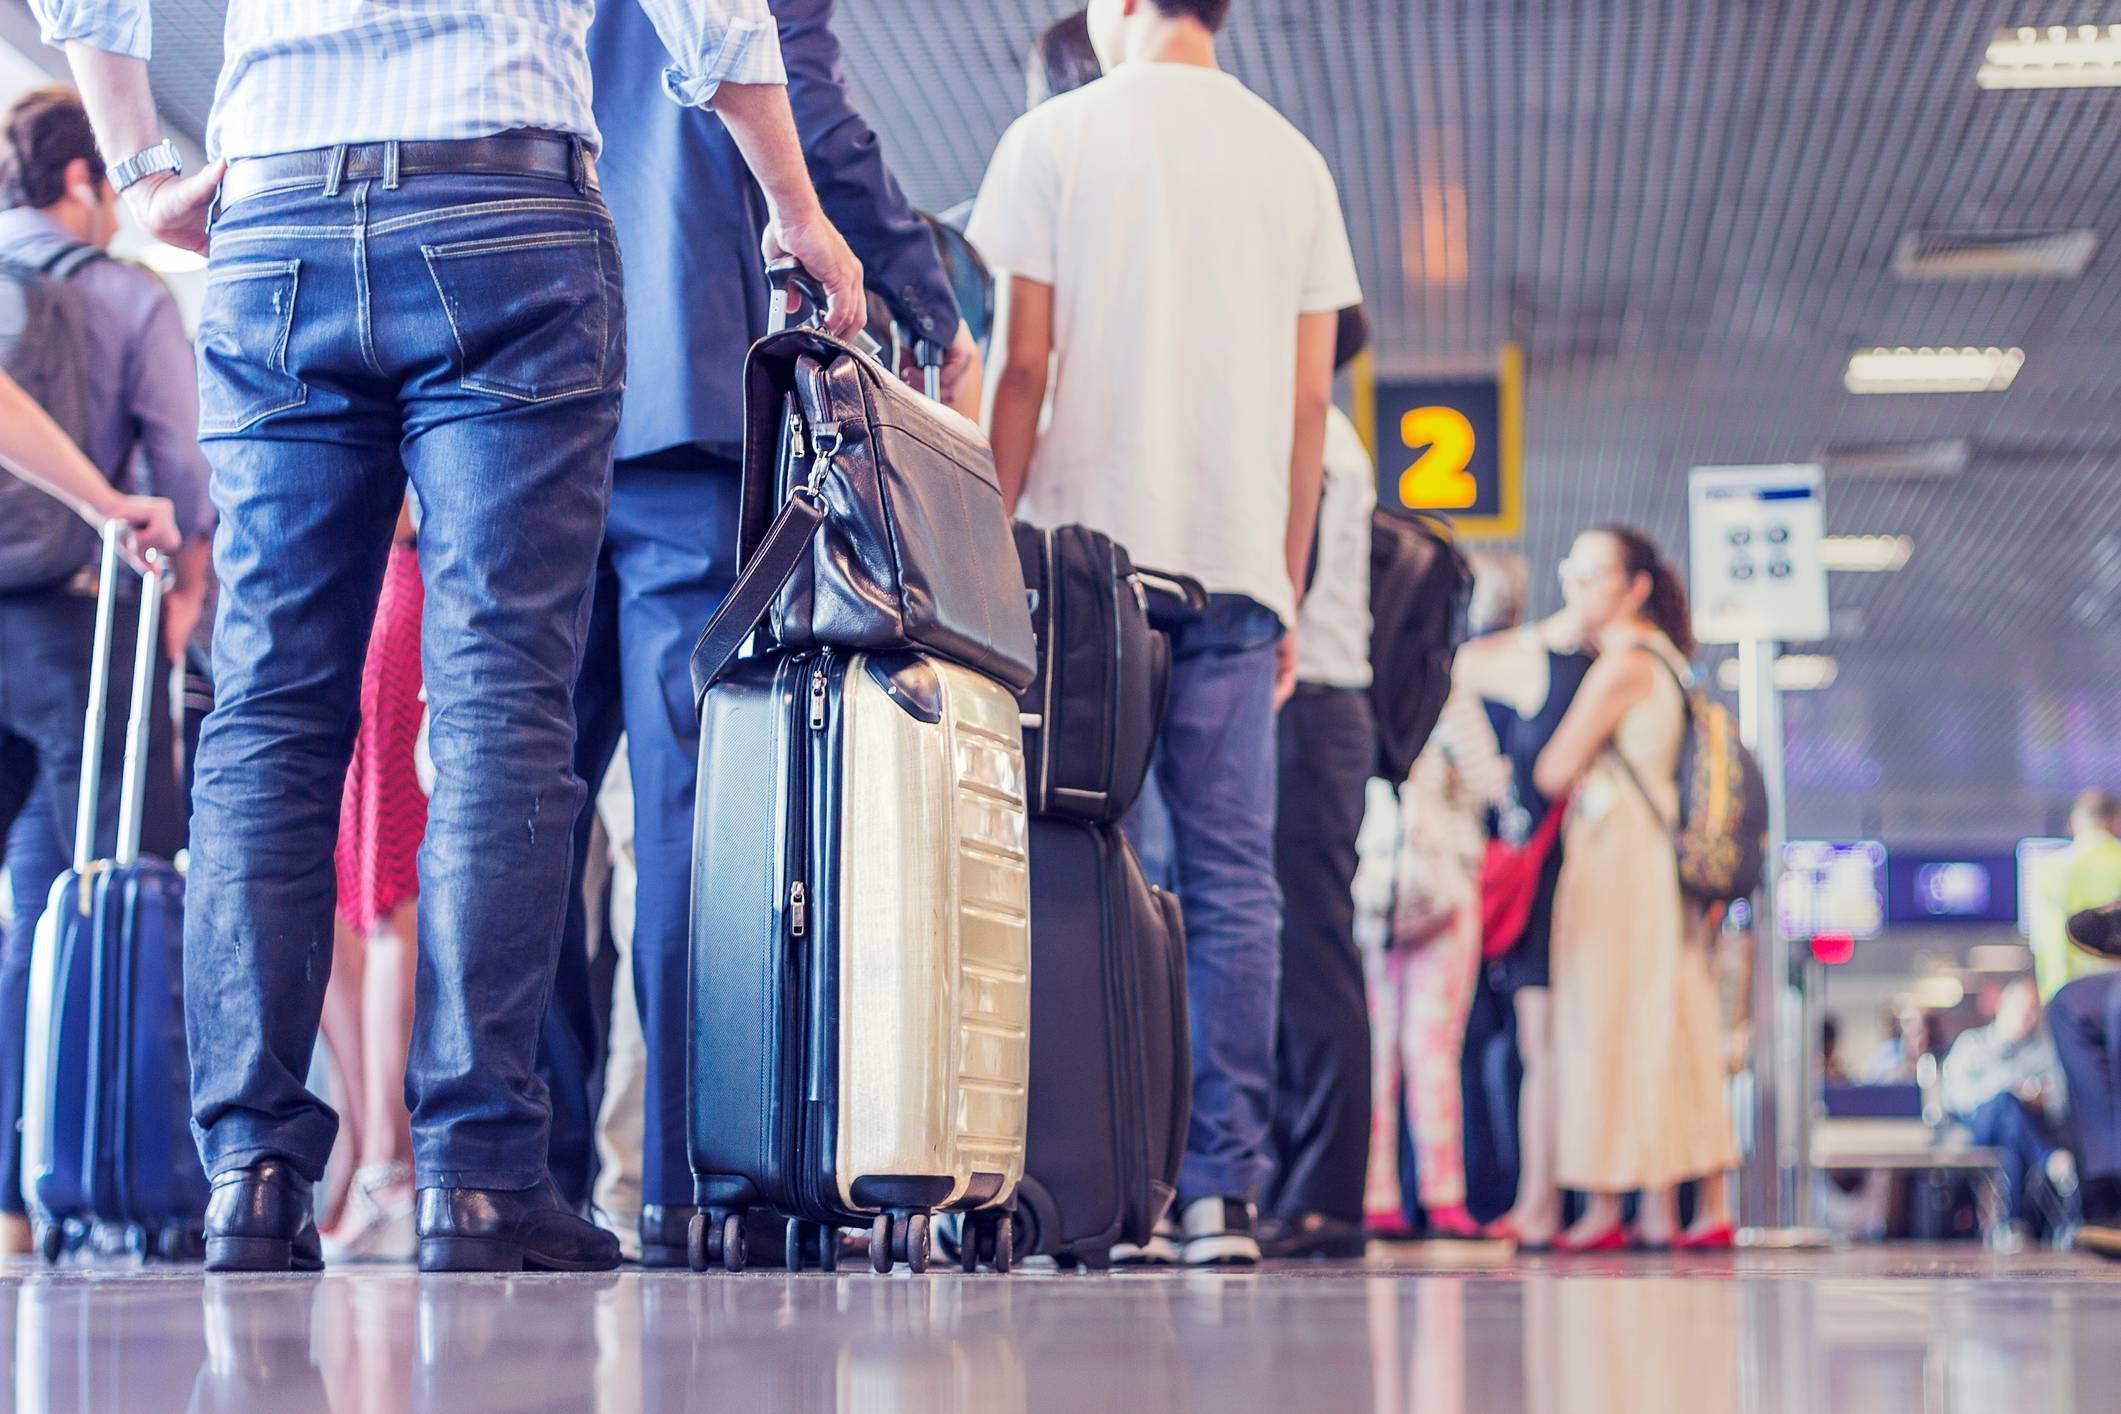 Airport passport queues